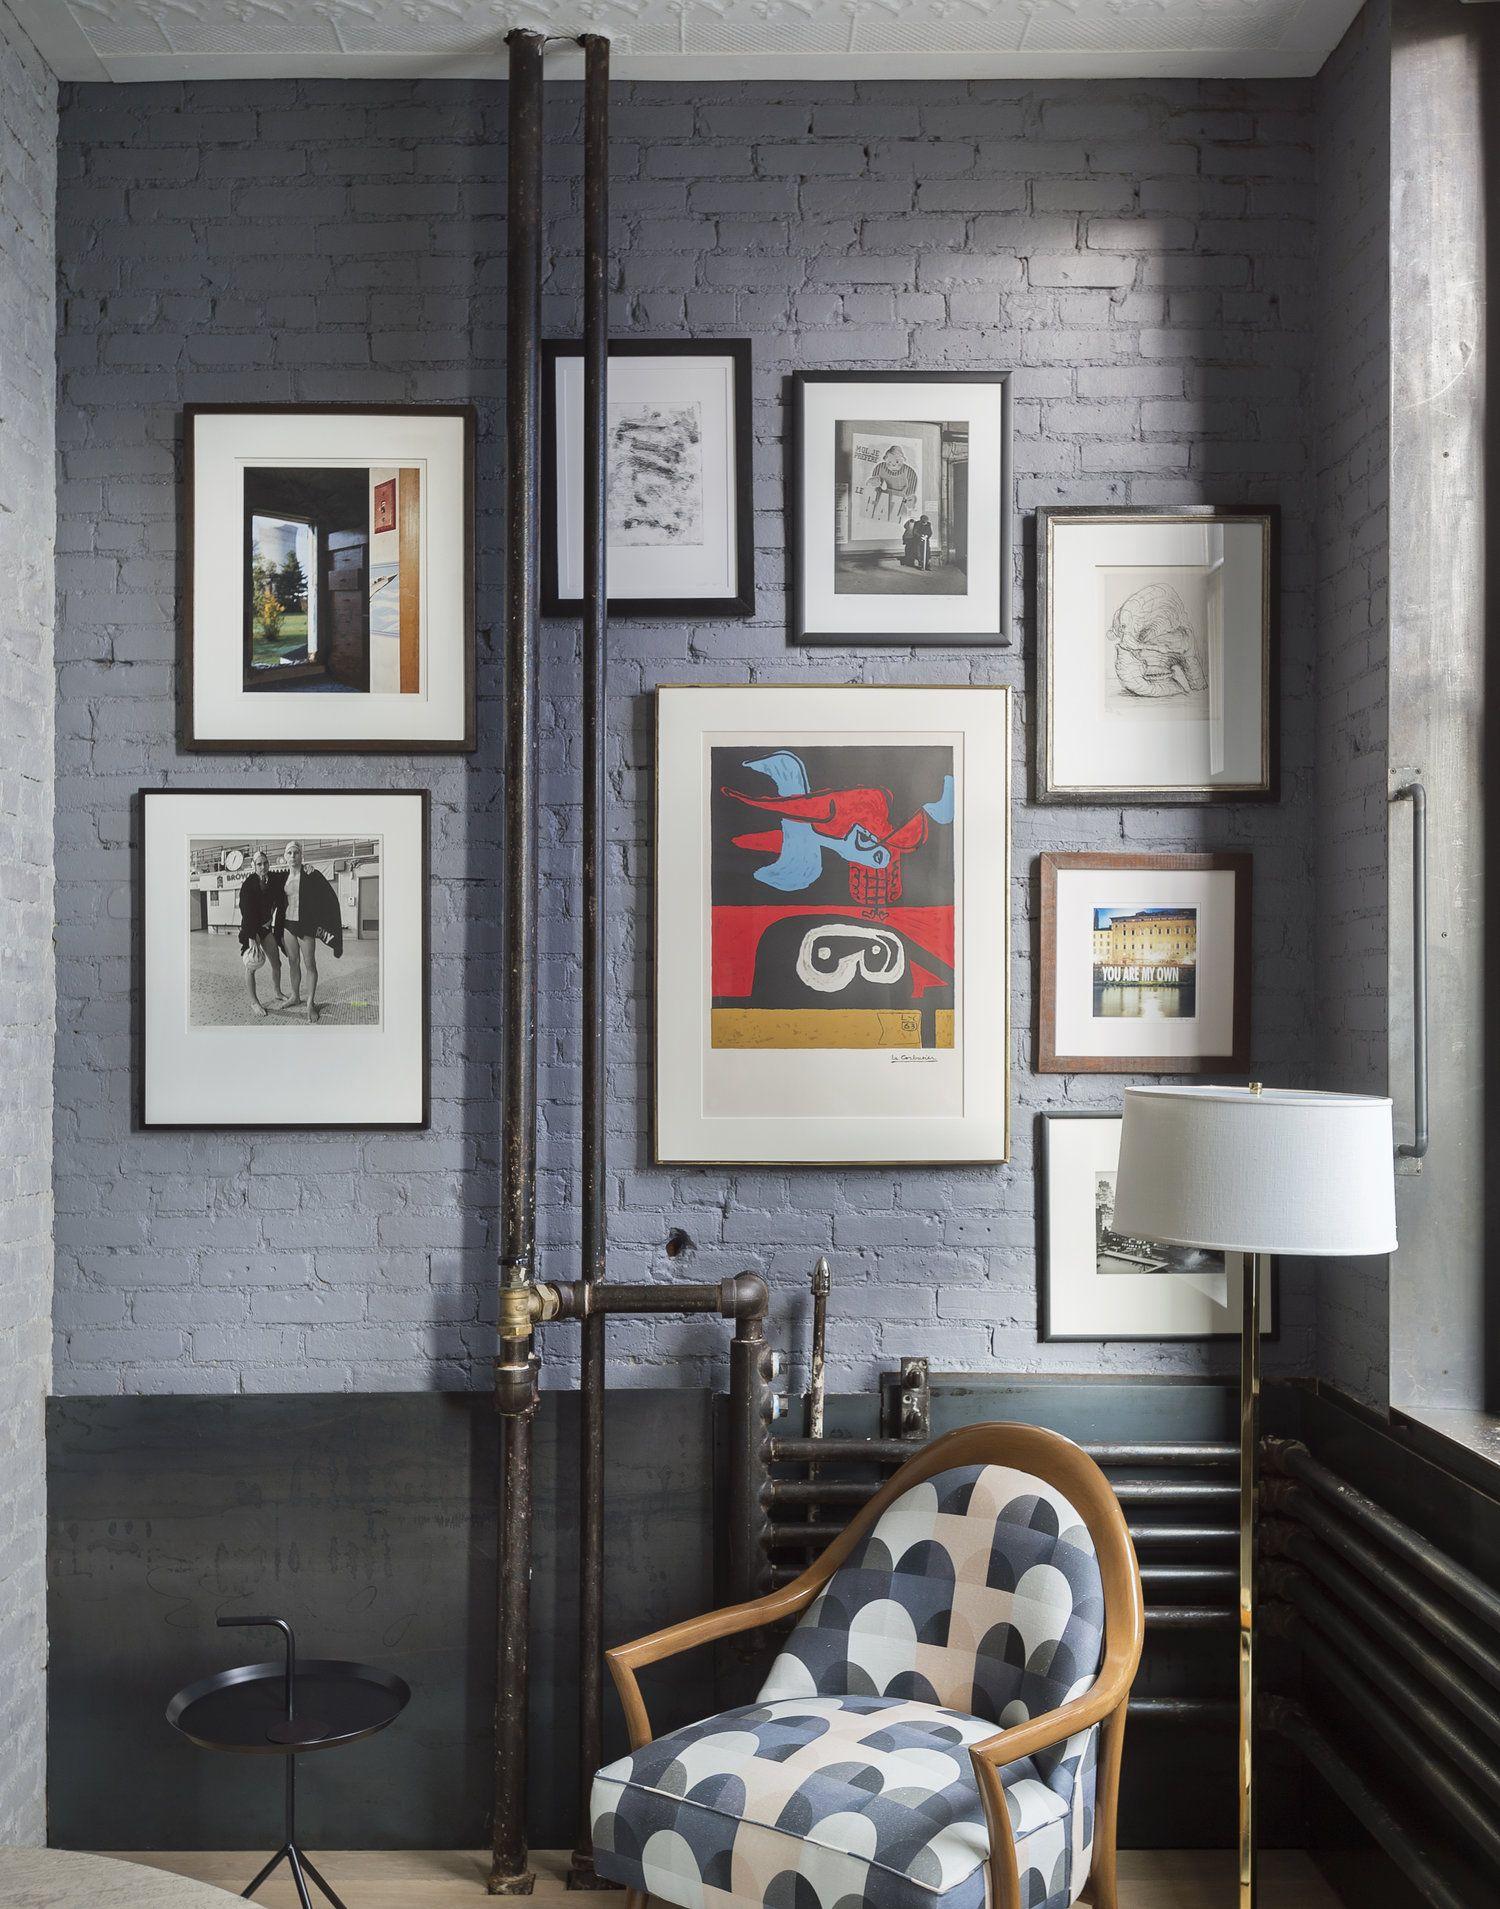 50 chic home decorating ideas easy interior design and decor tips rh housebeautiful com